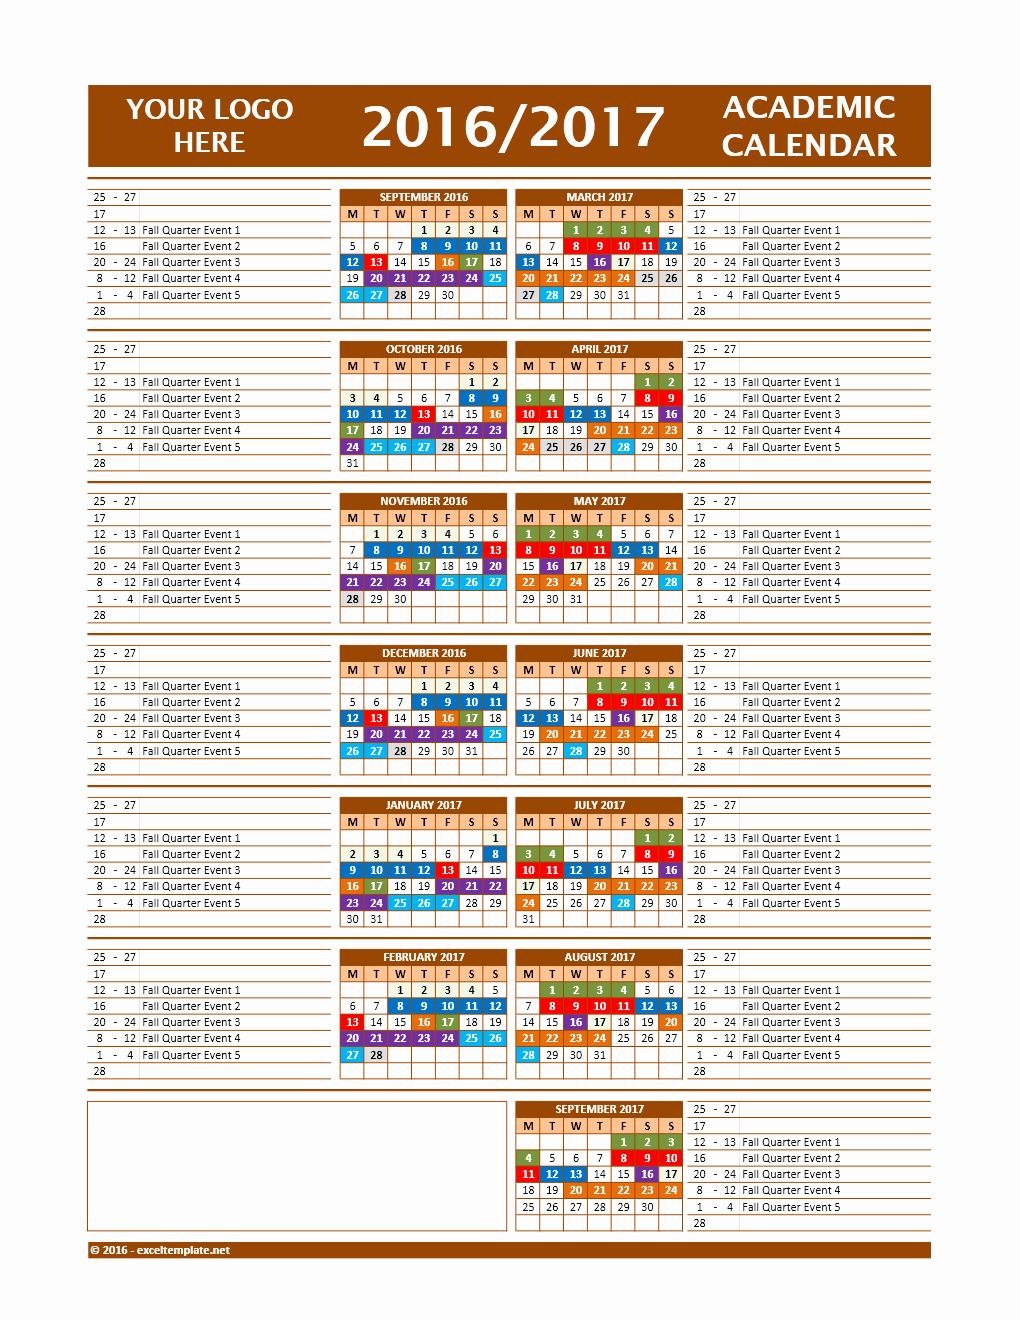 2016 2017 School Calendar Template Luxury 2017 2018 and 2016 2017 School Calendar Templates